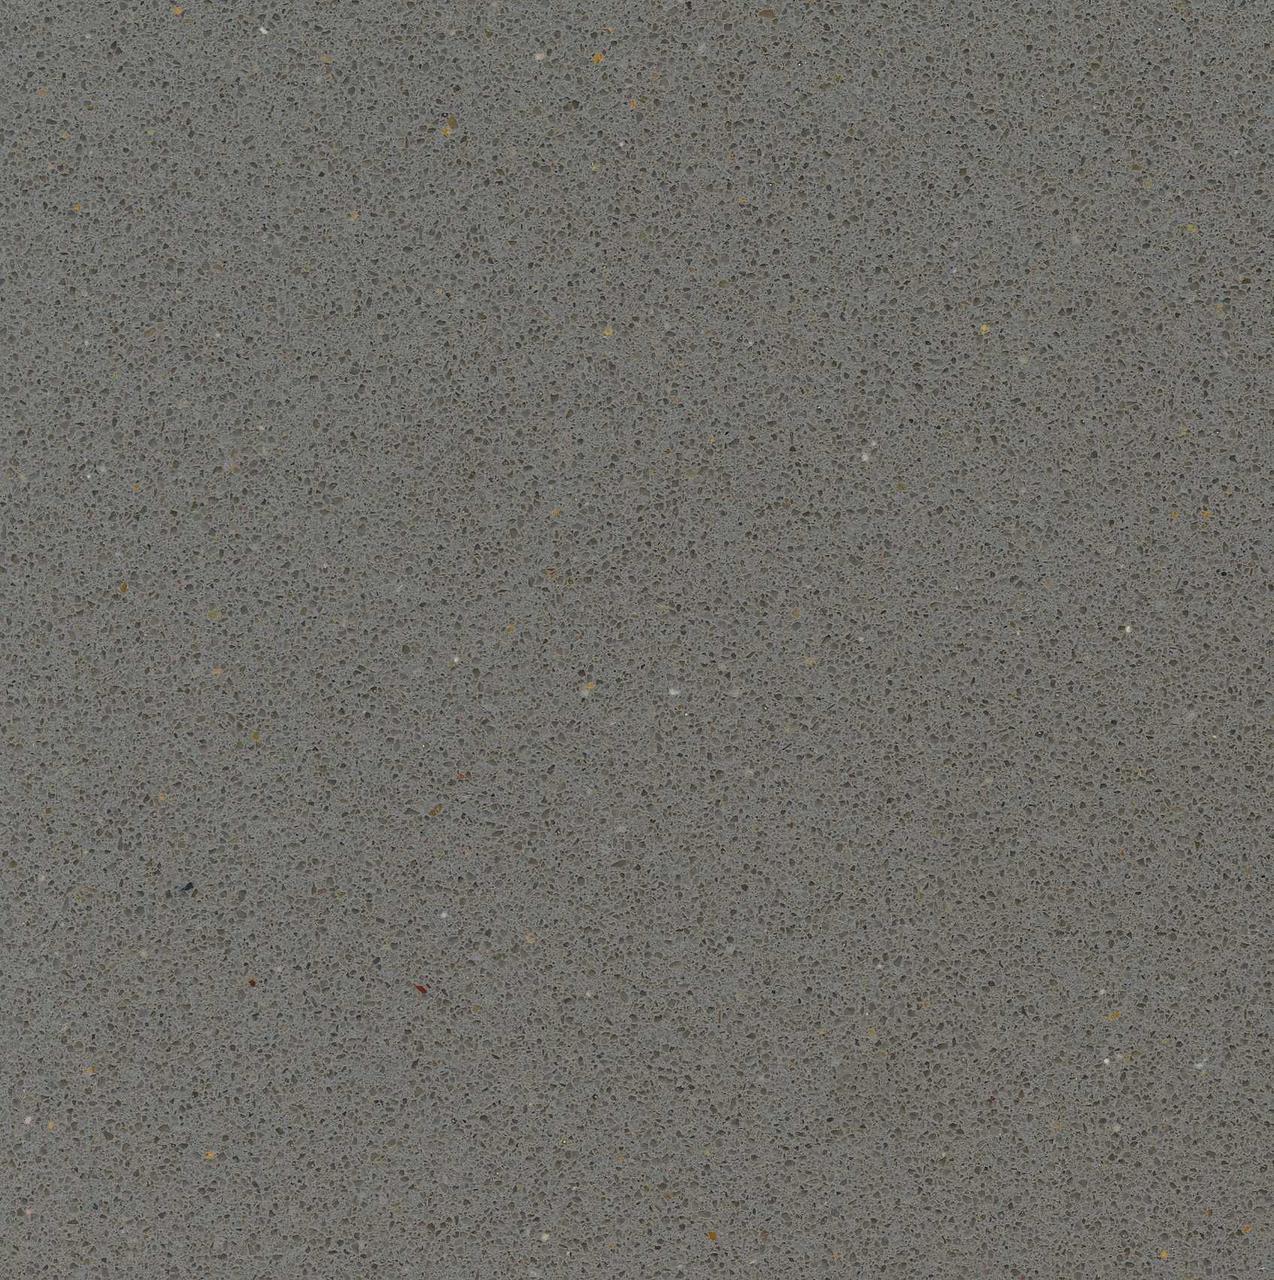 Искусственный камень, Кварц Silestone Gris Expo 20 мм